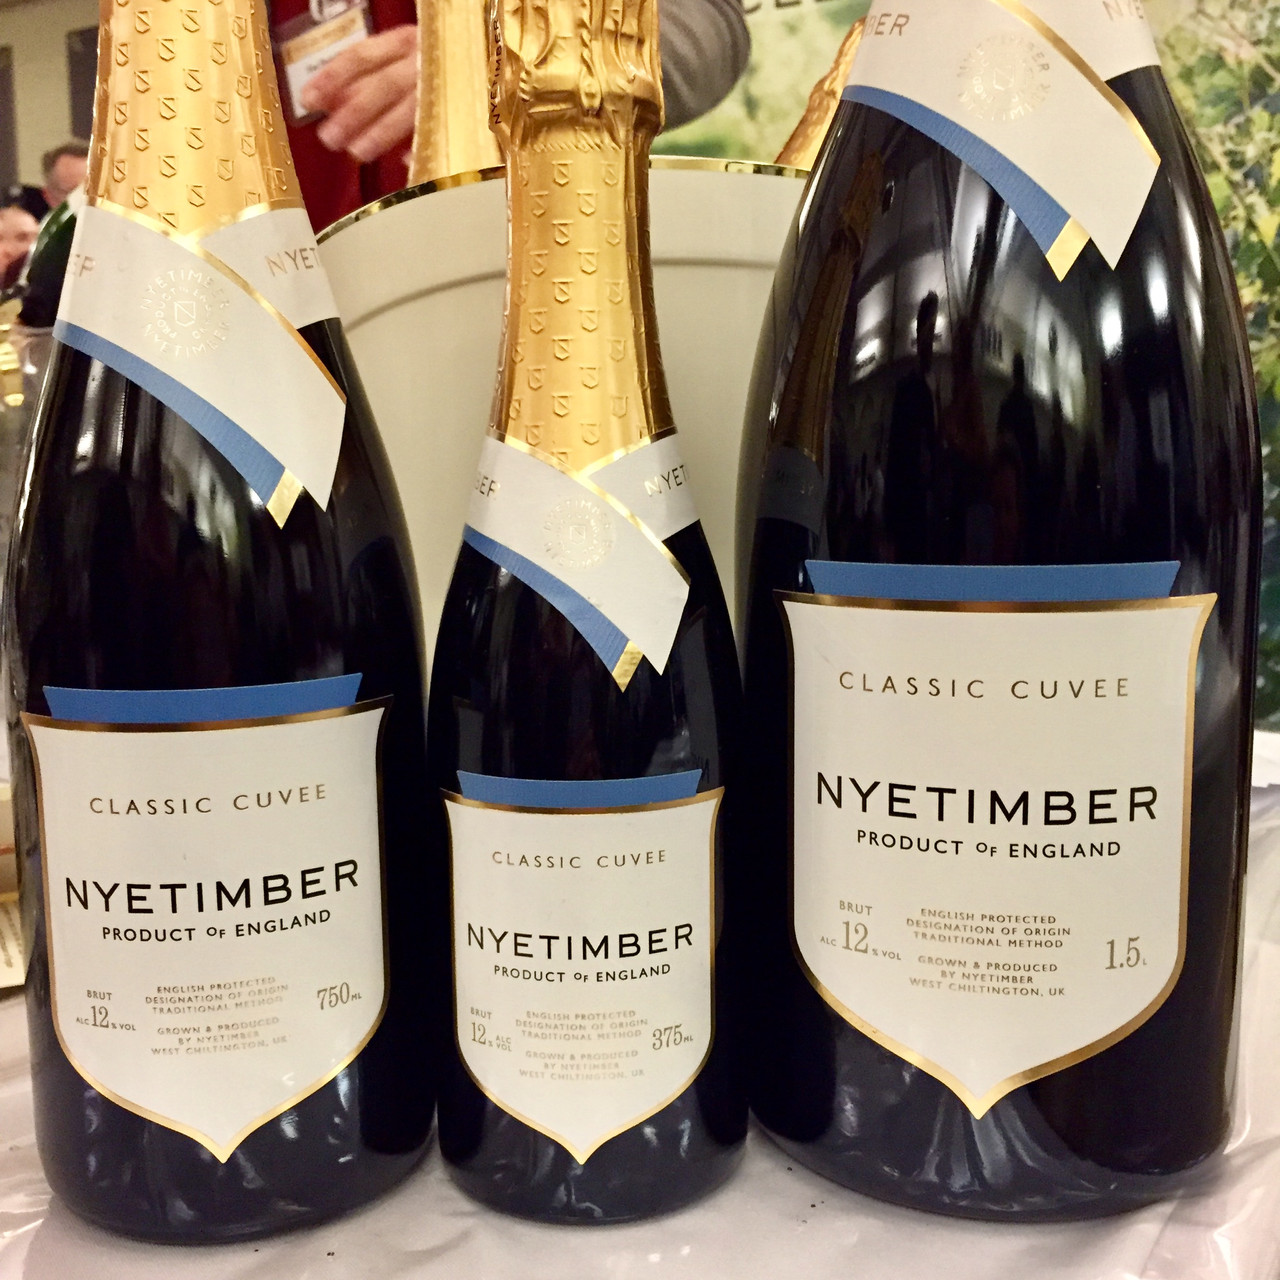 Nyetimber Classic Cuvée and Denbies Cubitt Blanc de Noirs 2013